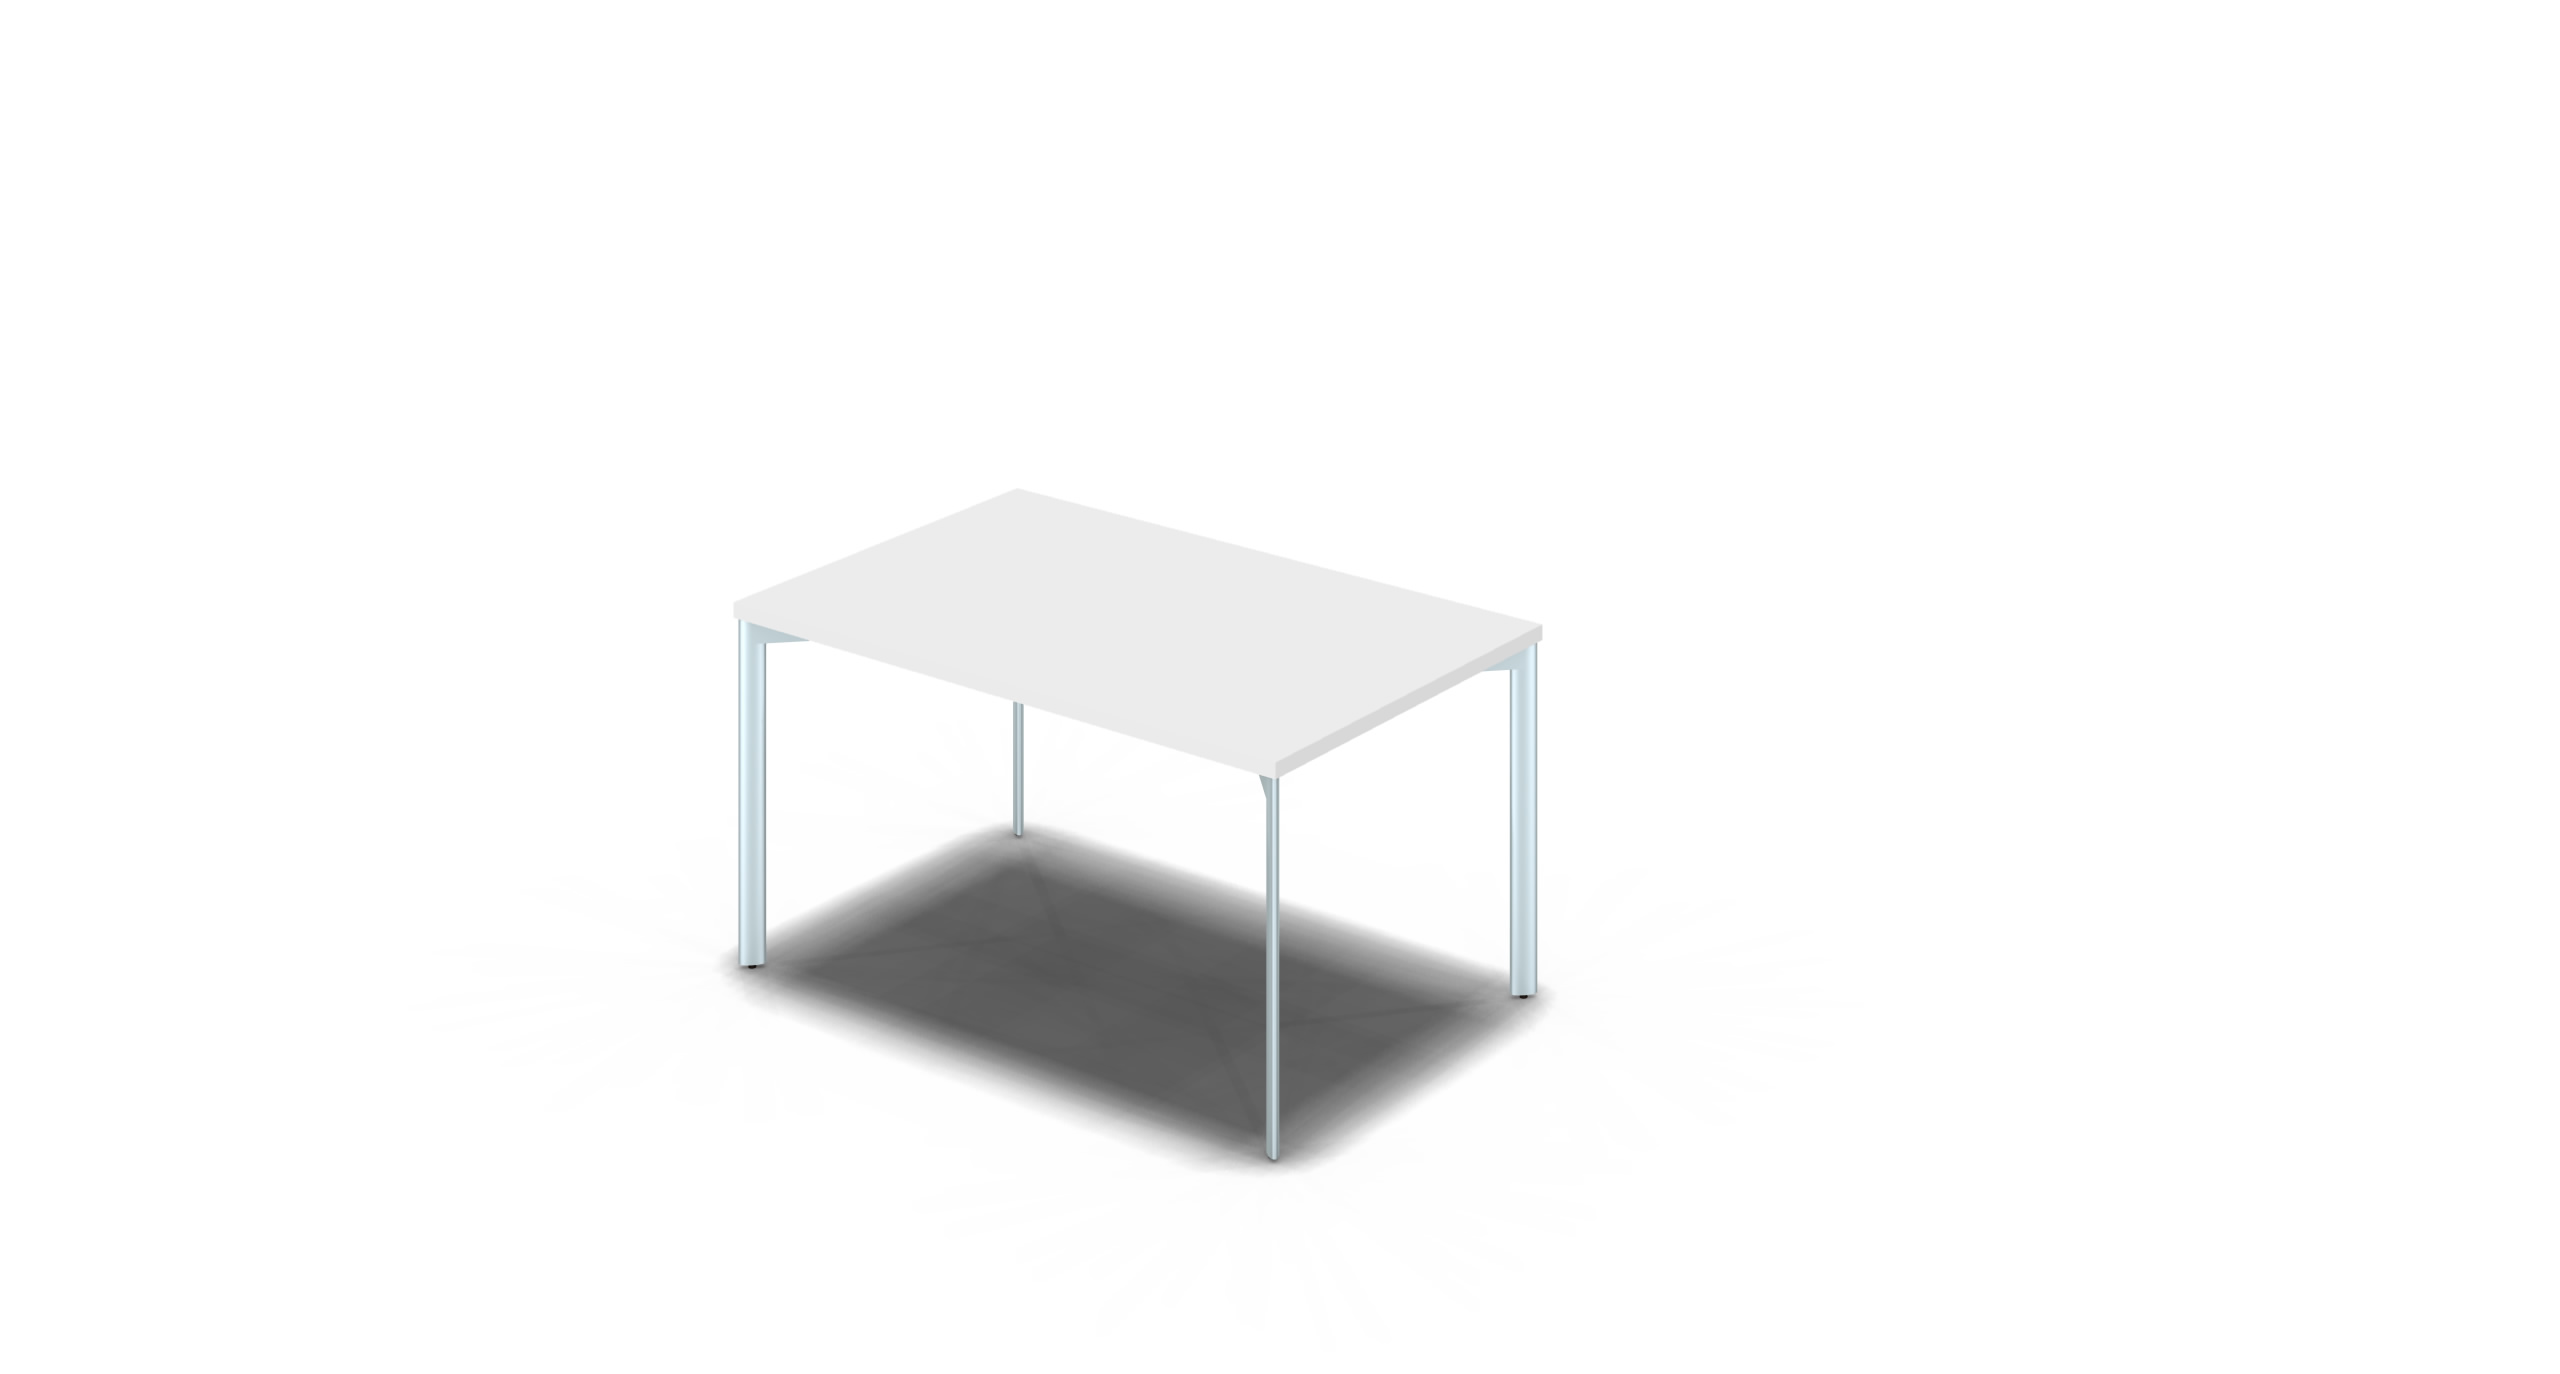 Table_Slim_1200x750_Silver_White_noOption